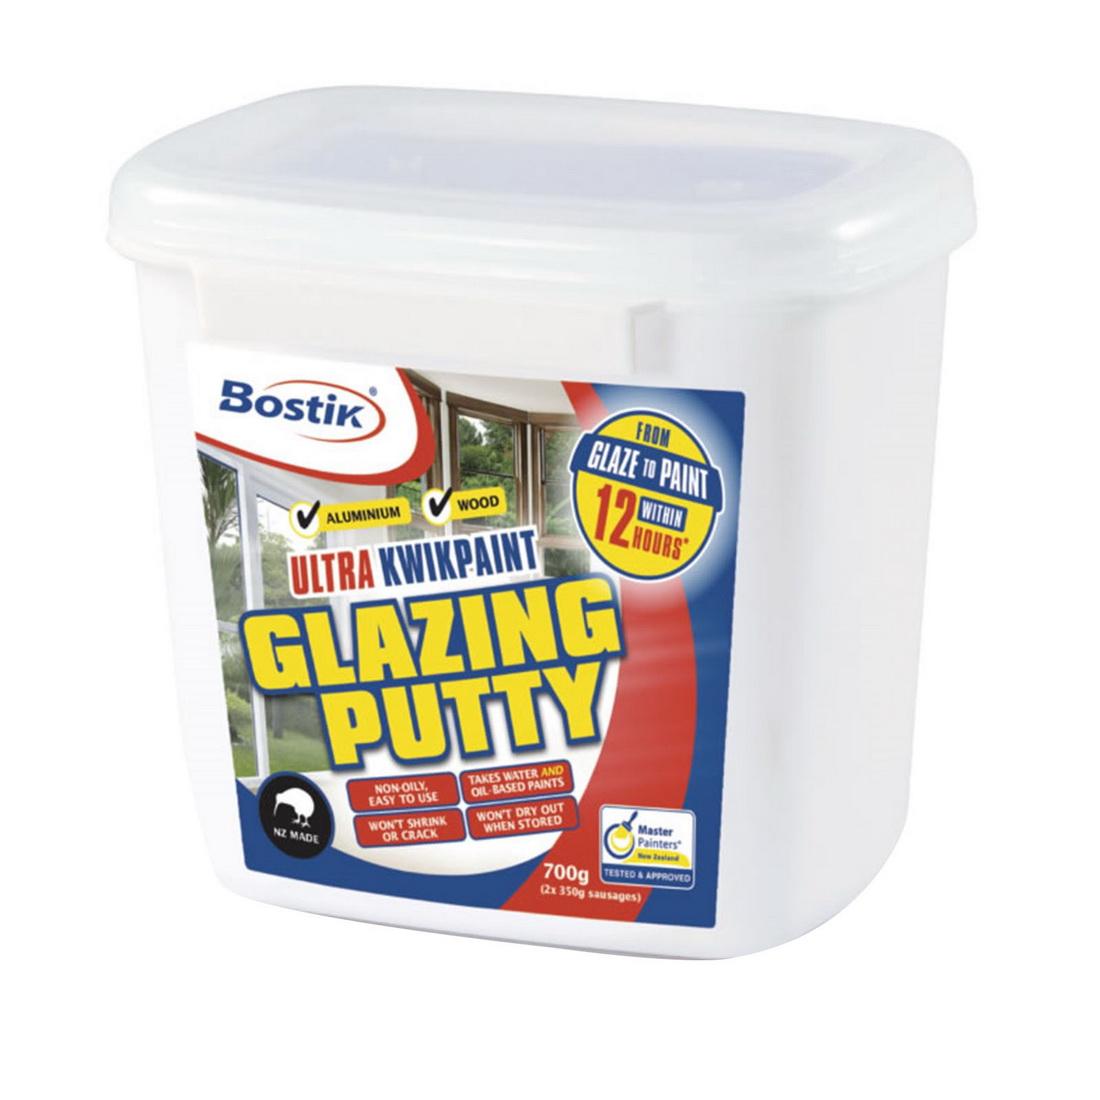 700g Ultra Kwikpaint Glazing Putty